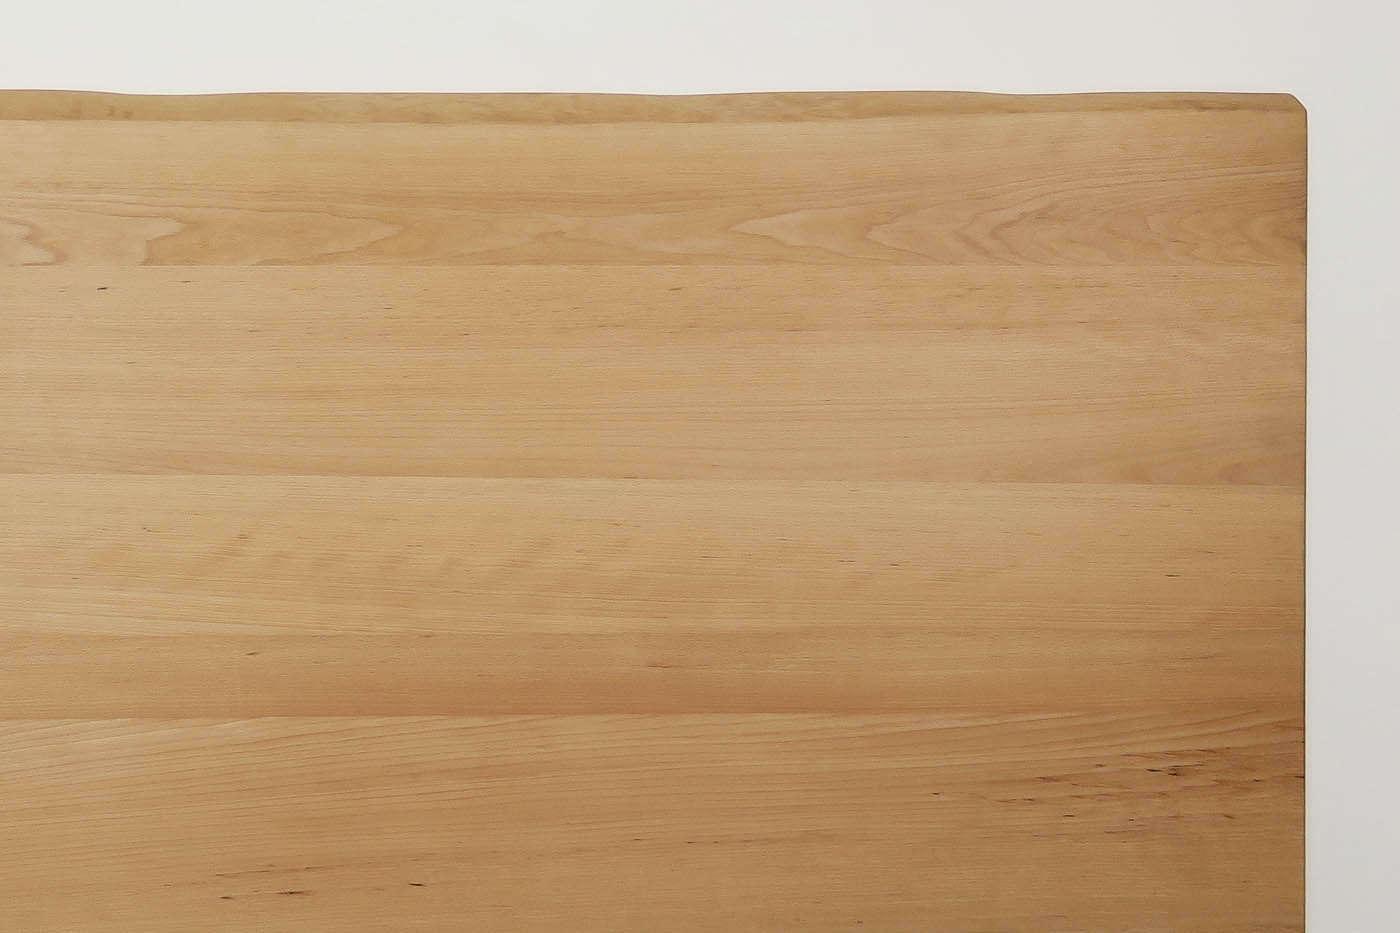 Tischplatte Massivholz Baumkante Buche Astfrei